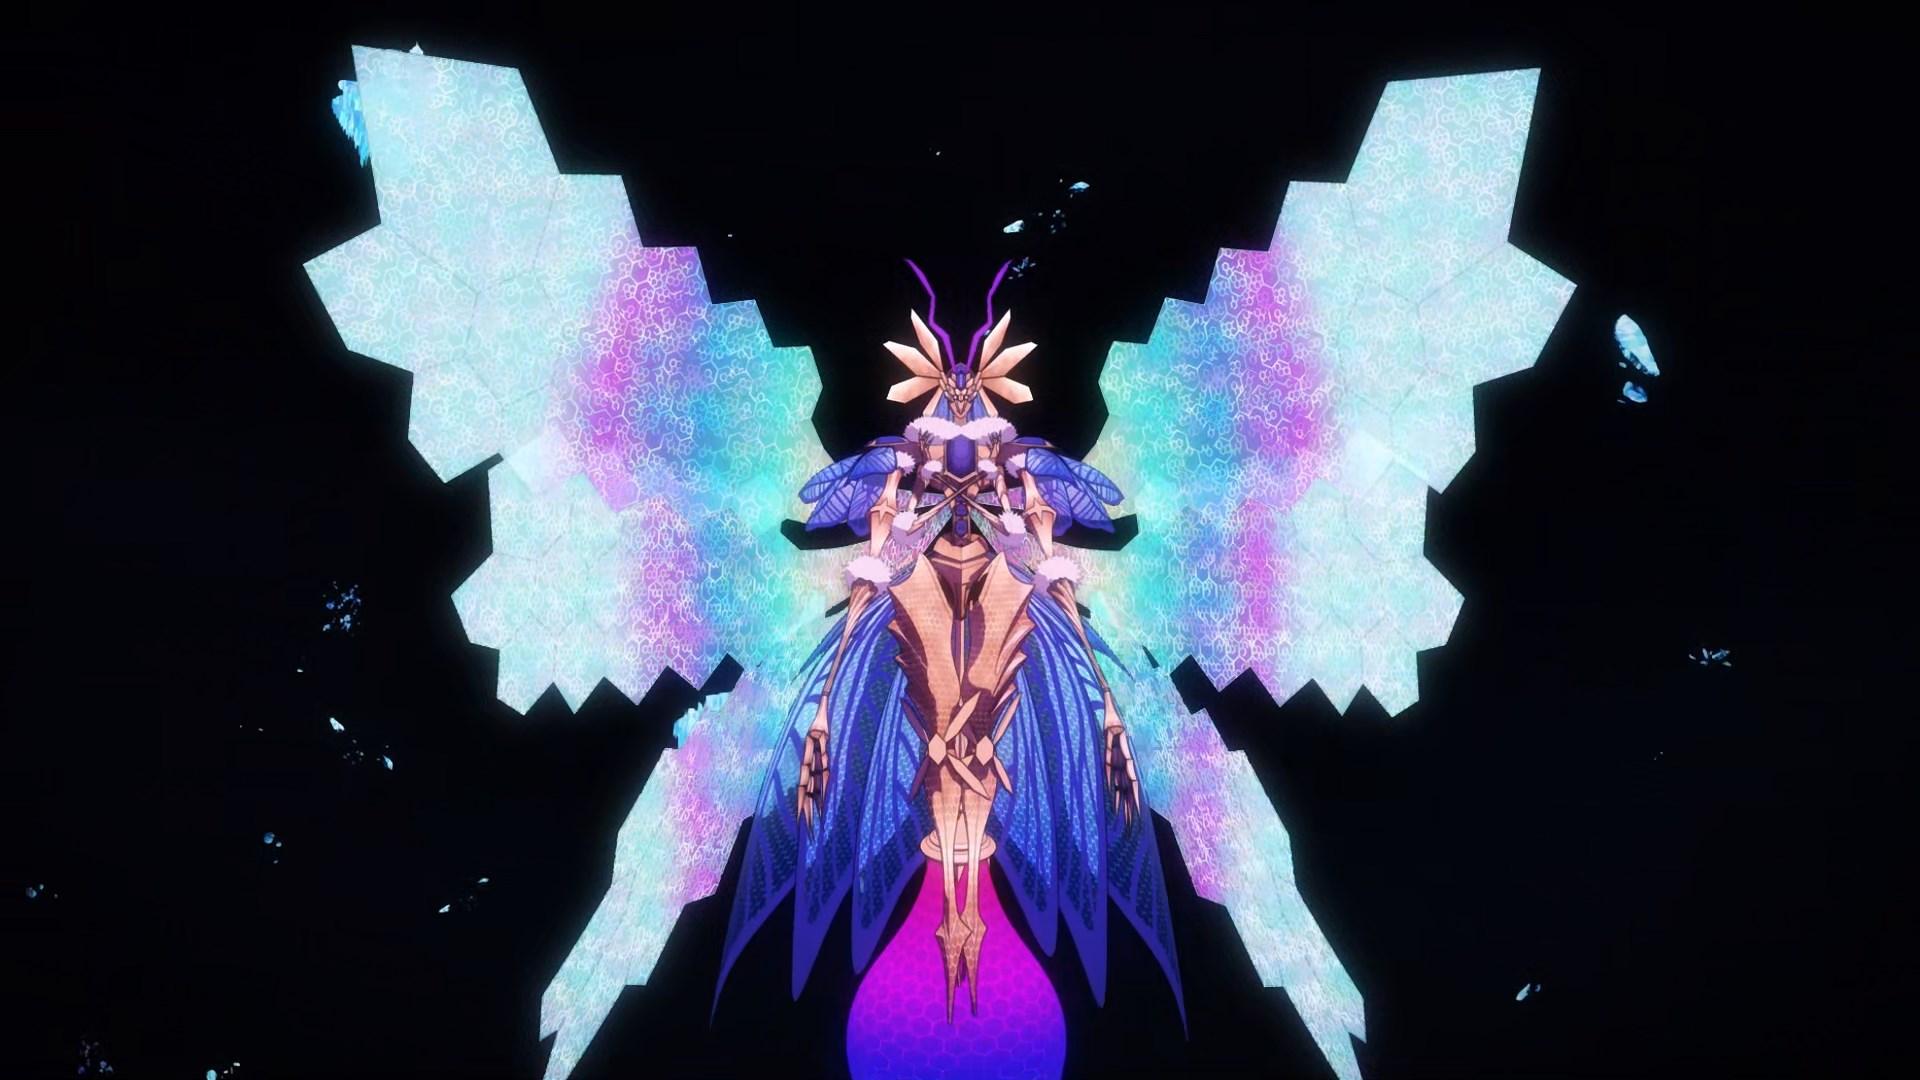 Digimon Adventure: Last Evolution Kizuna BD 10-Bit Subtitle Indonesia